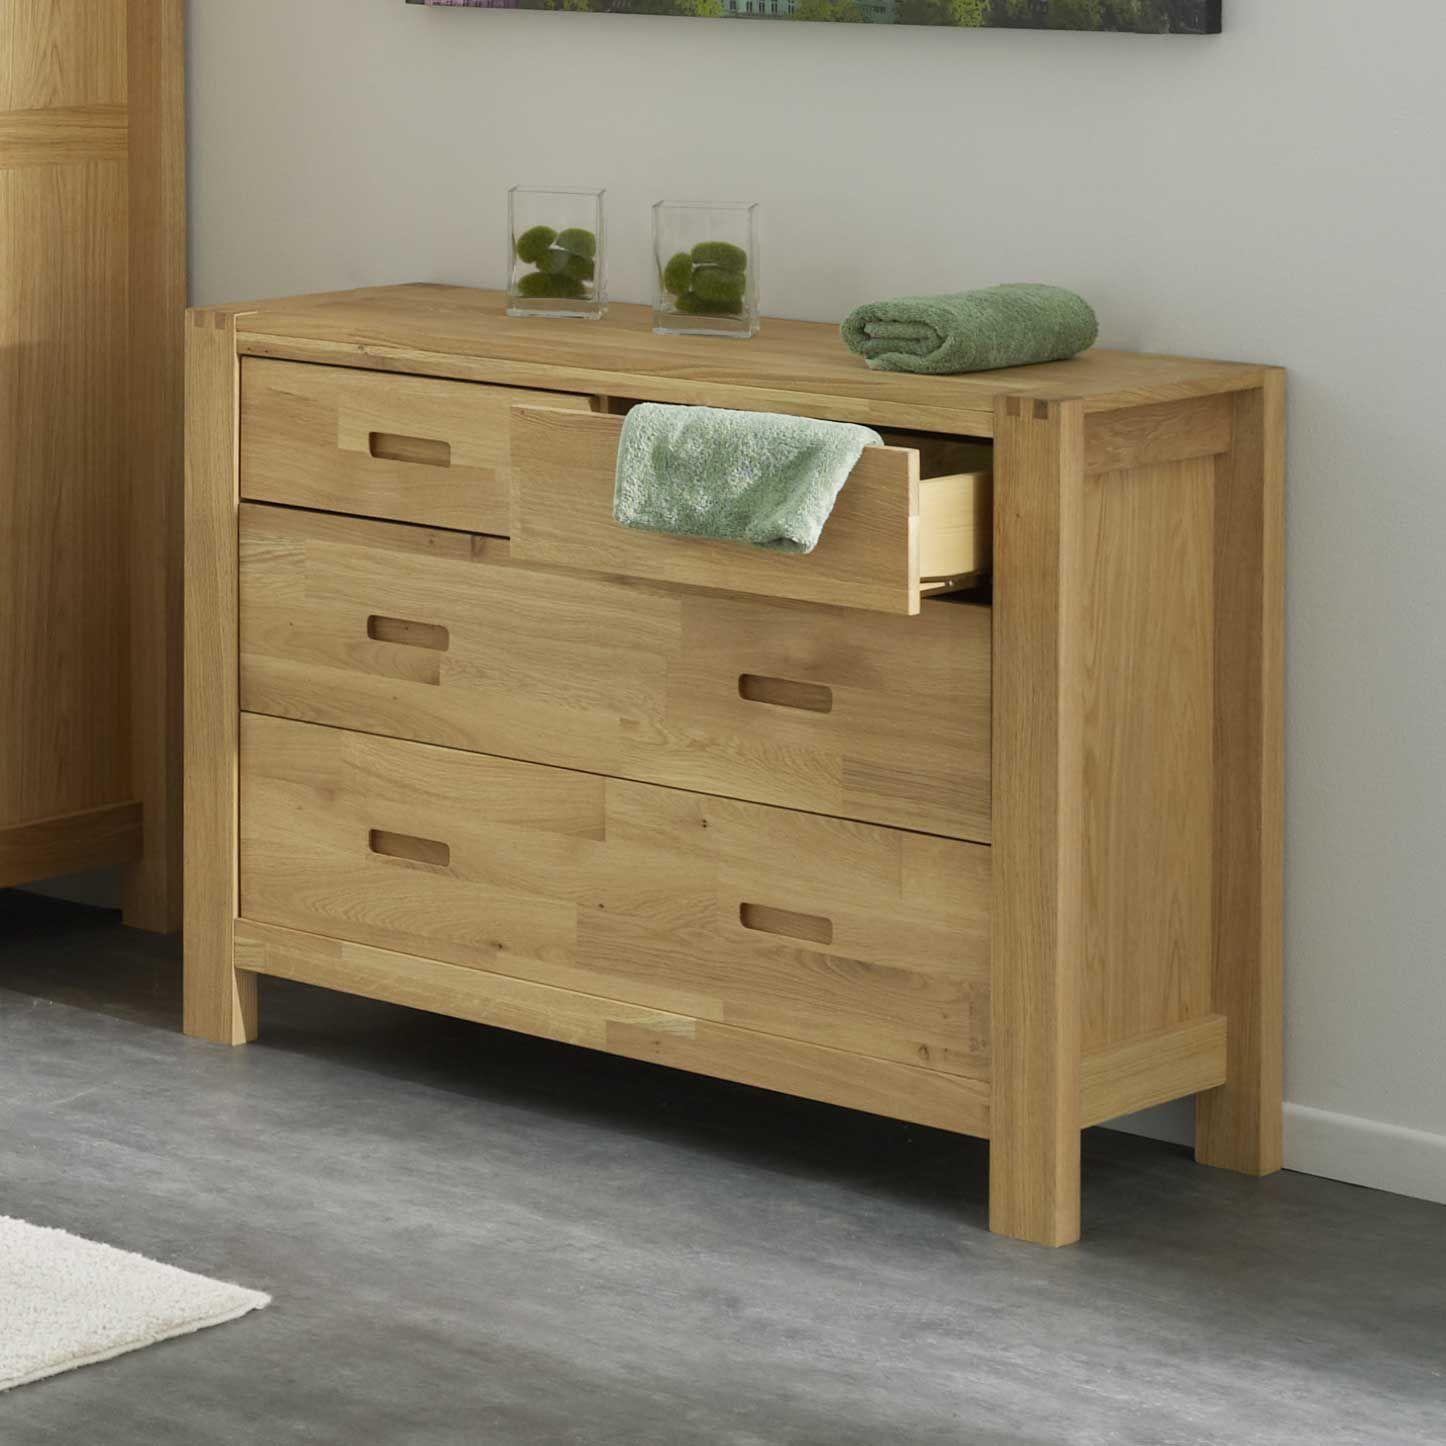 commode 4 tiroirs en ch ne l106xp44xh85cm hawke akhal port offert d co meubles pinterest. Black Bedroom Furniture Sets. Home Design Ideas